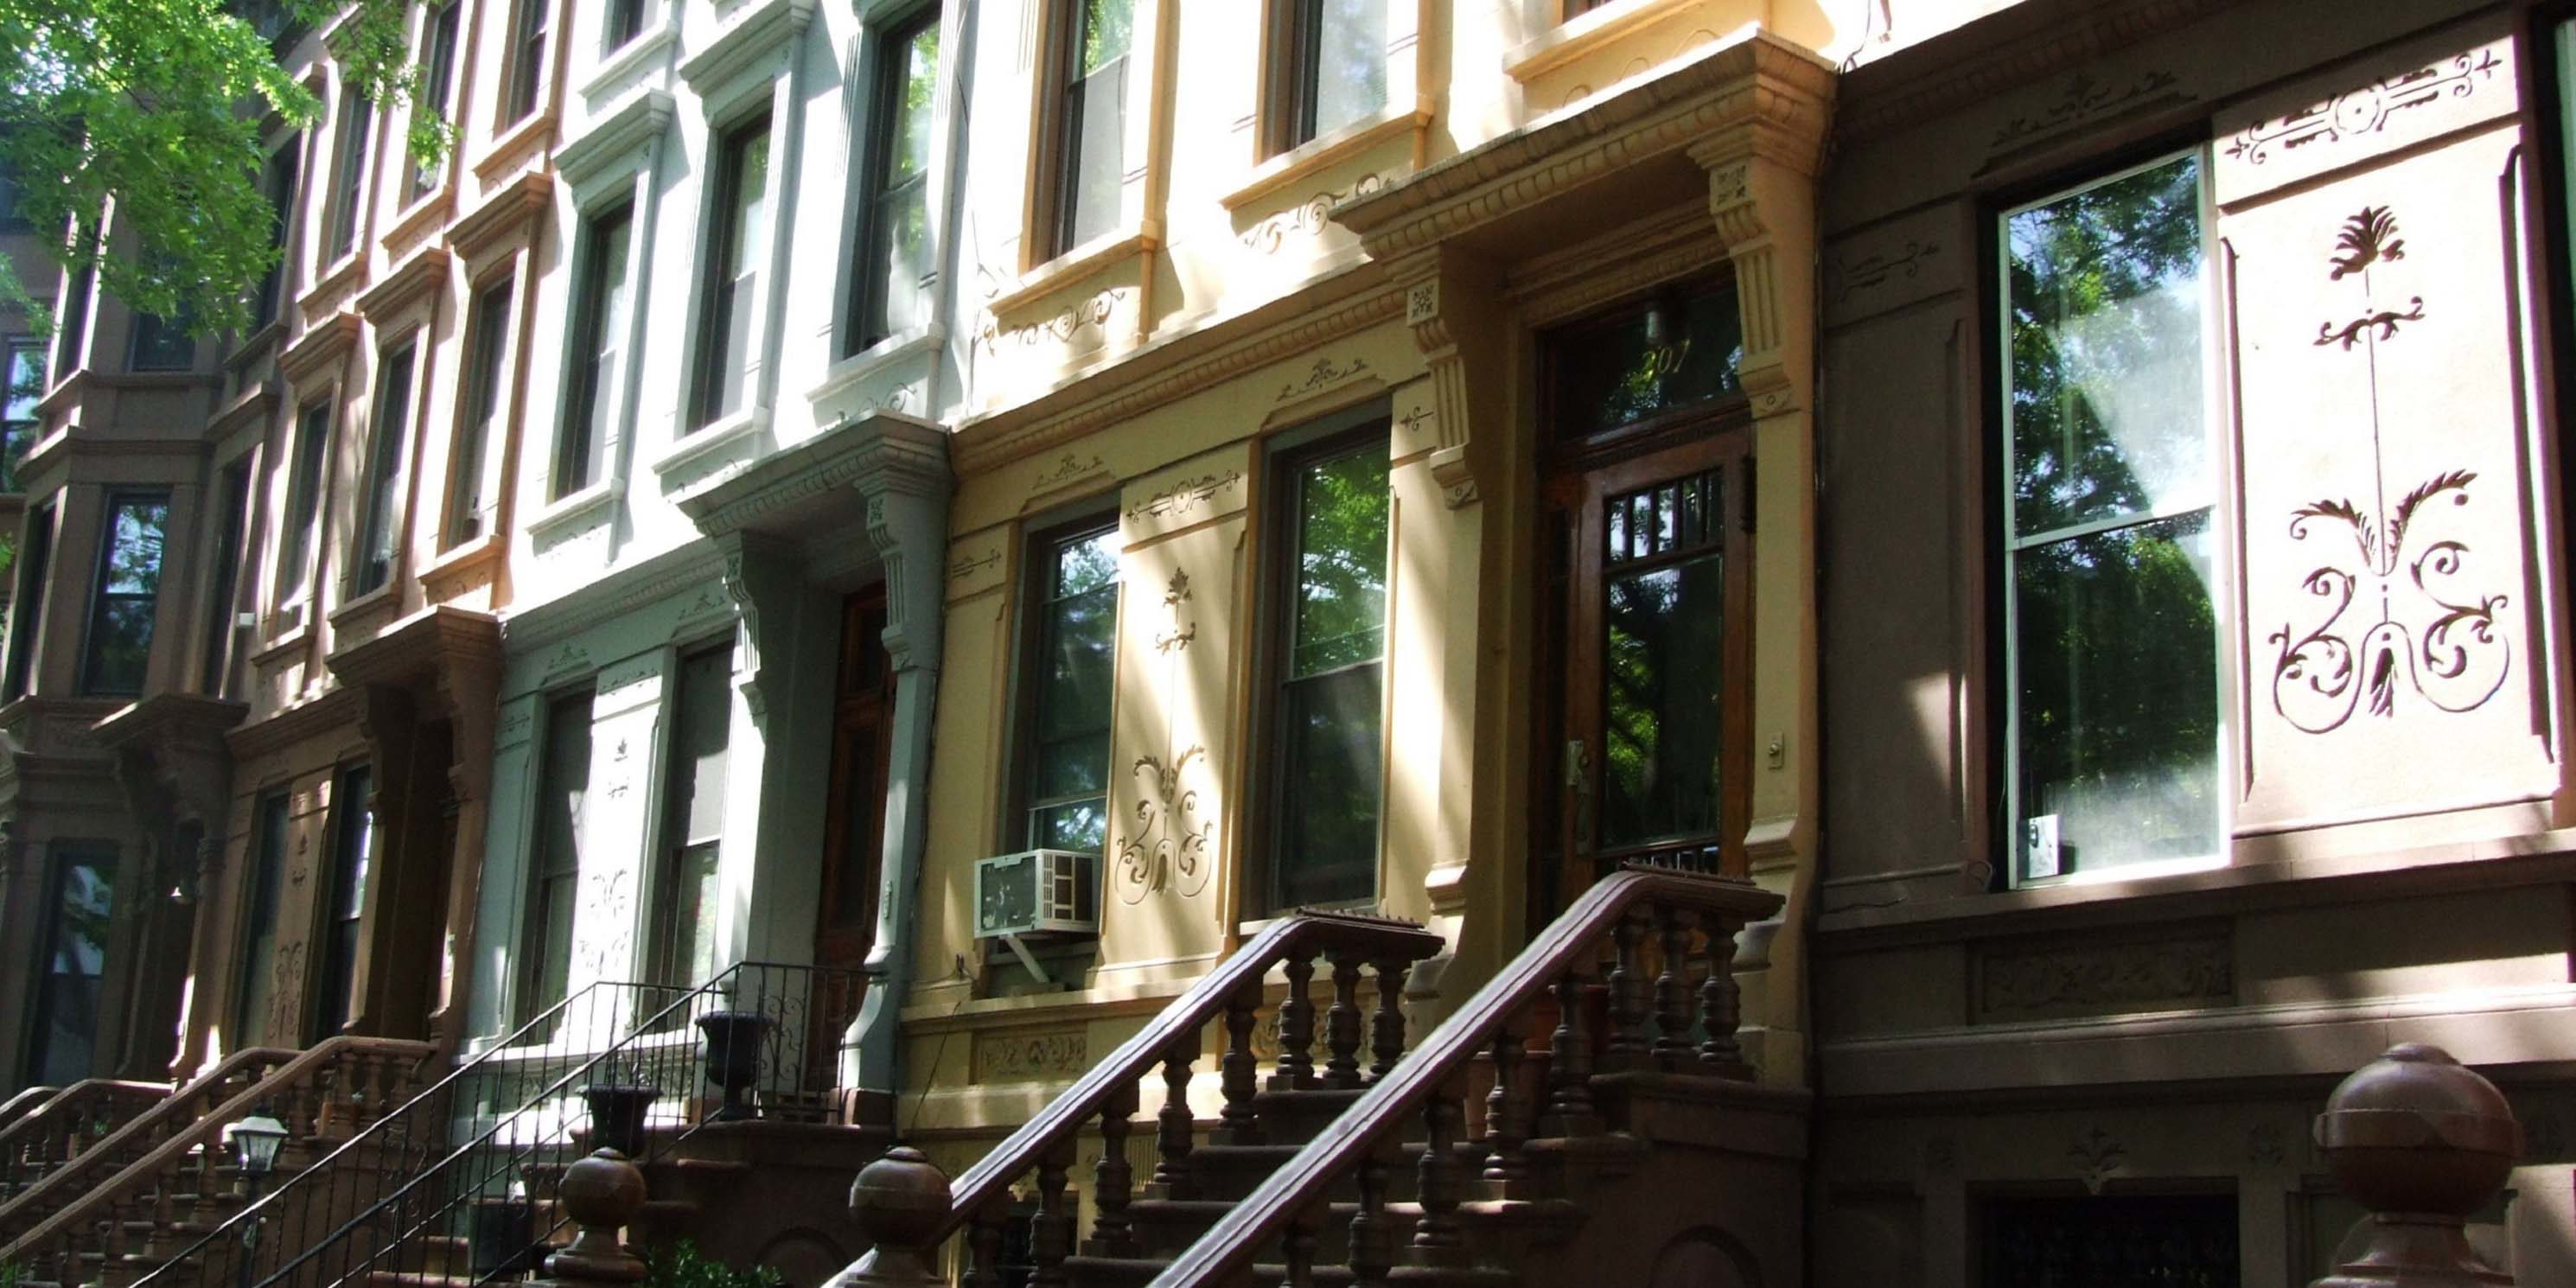 entrances of brownstones on Jefferson Avenue in Brooklyn